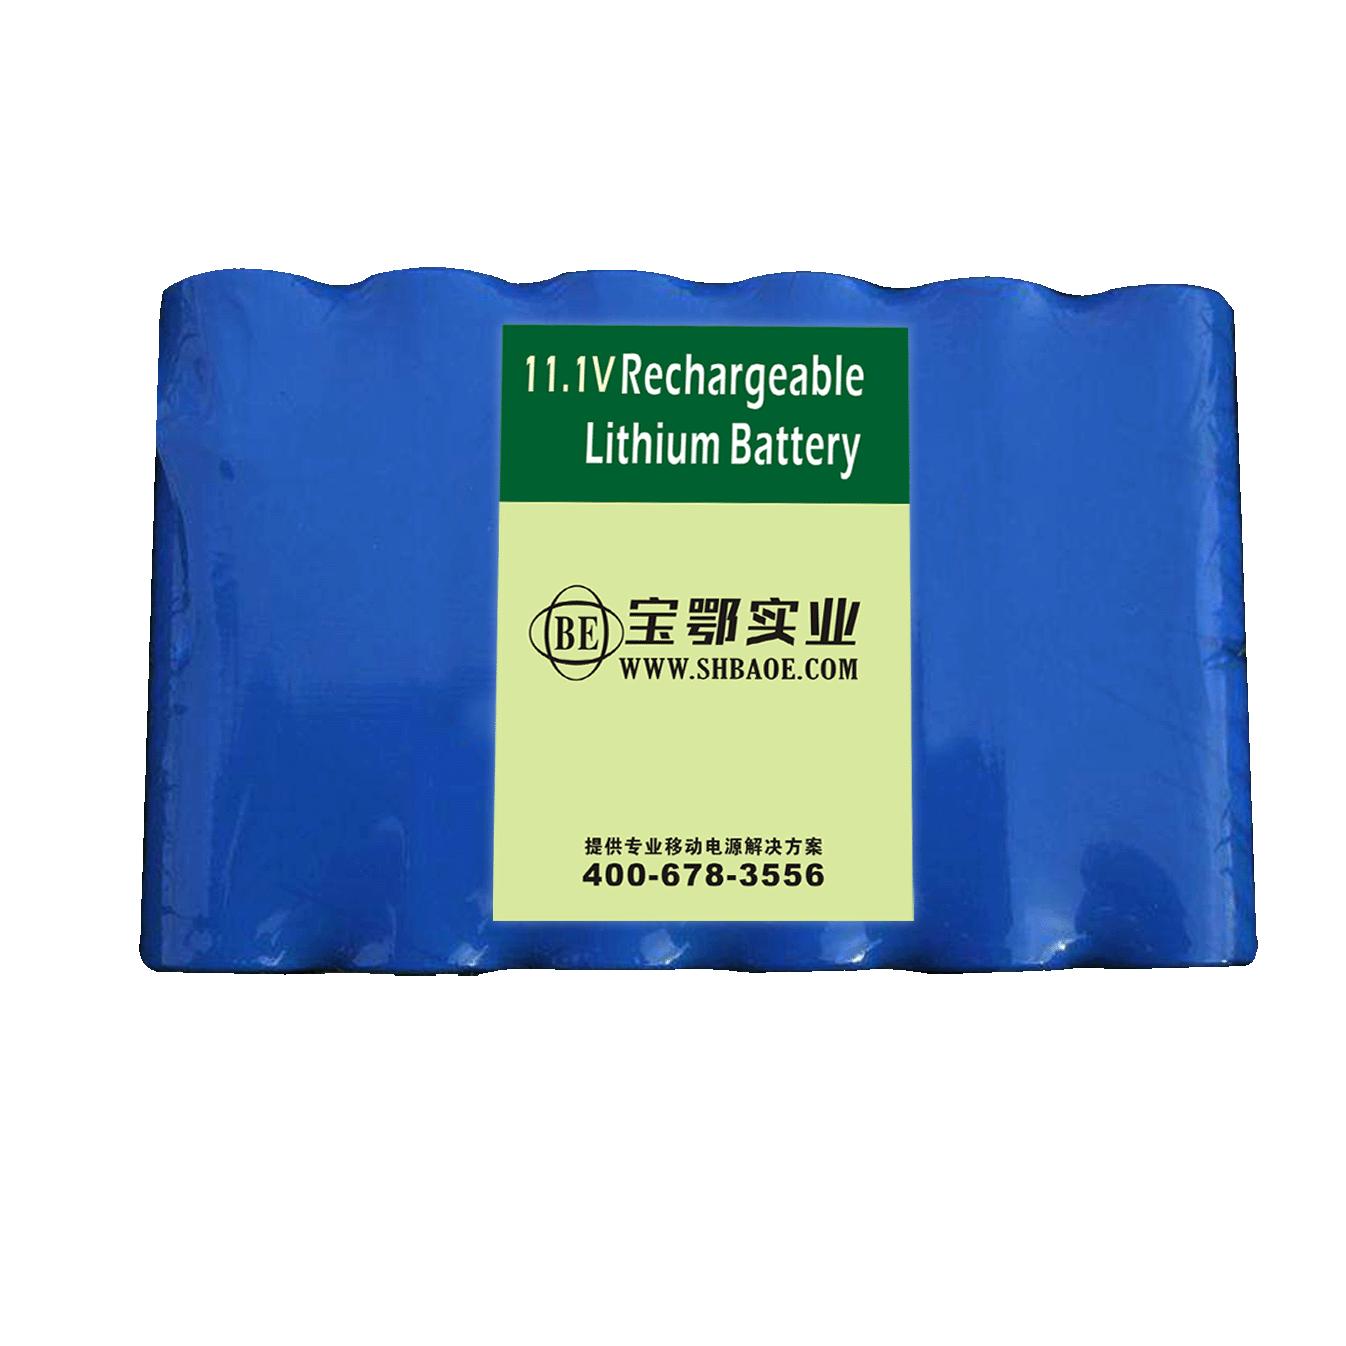 11.1V-4.4AH三元储能18650信号屏蔽仪锂电池组